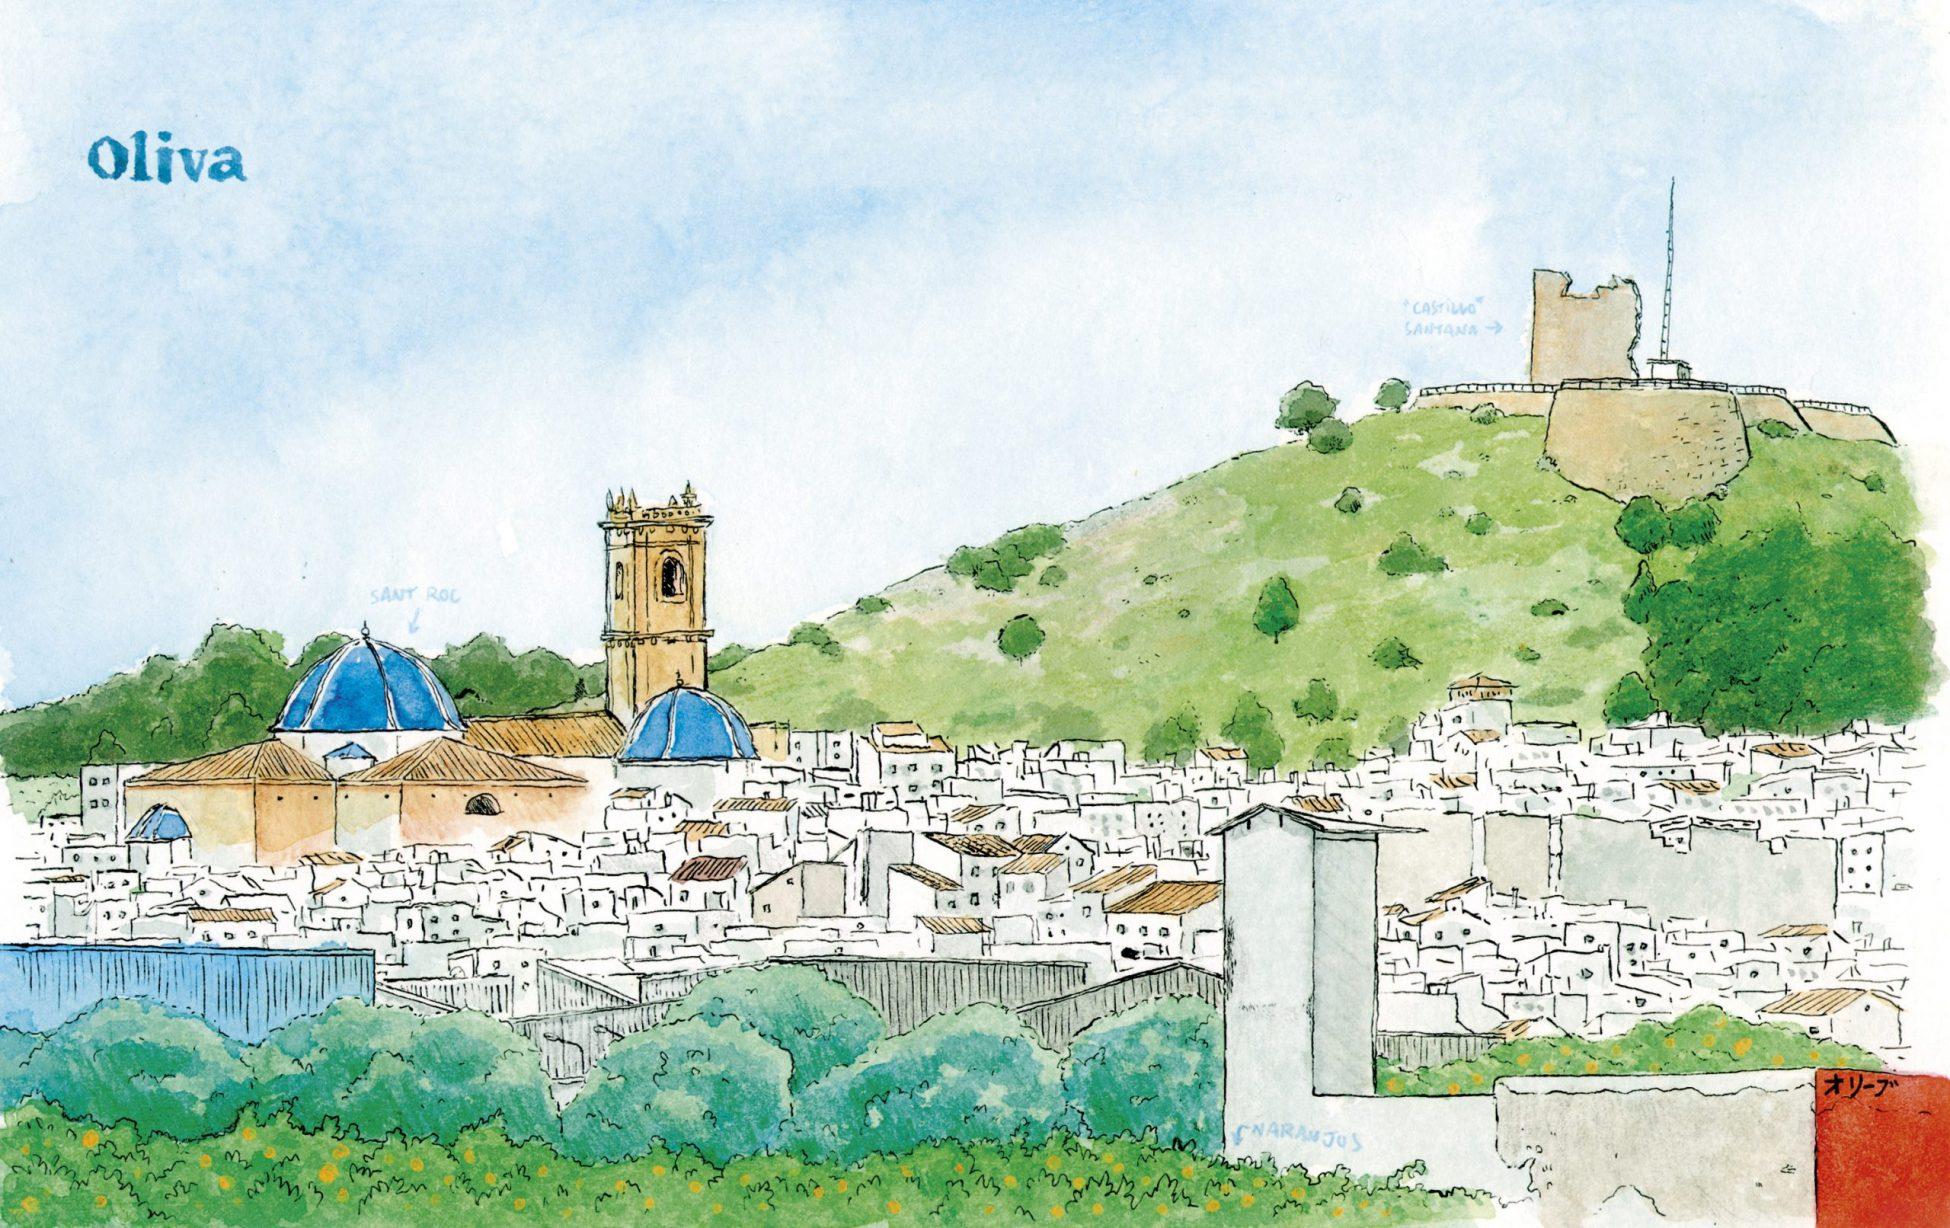 Lámina con una acuarela del casco antiguo del municipio de Oliva (Valencia). Cuadro para enmarcar con una acuarela del castillo de Santa Ana y la iglesia de Sant Roque en La Safor